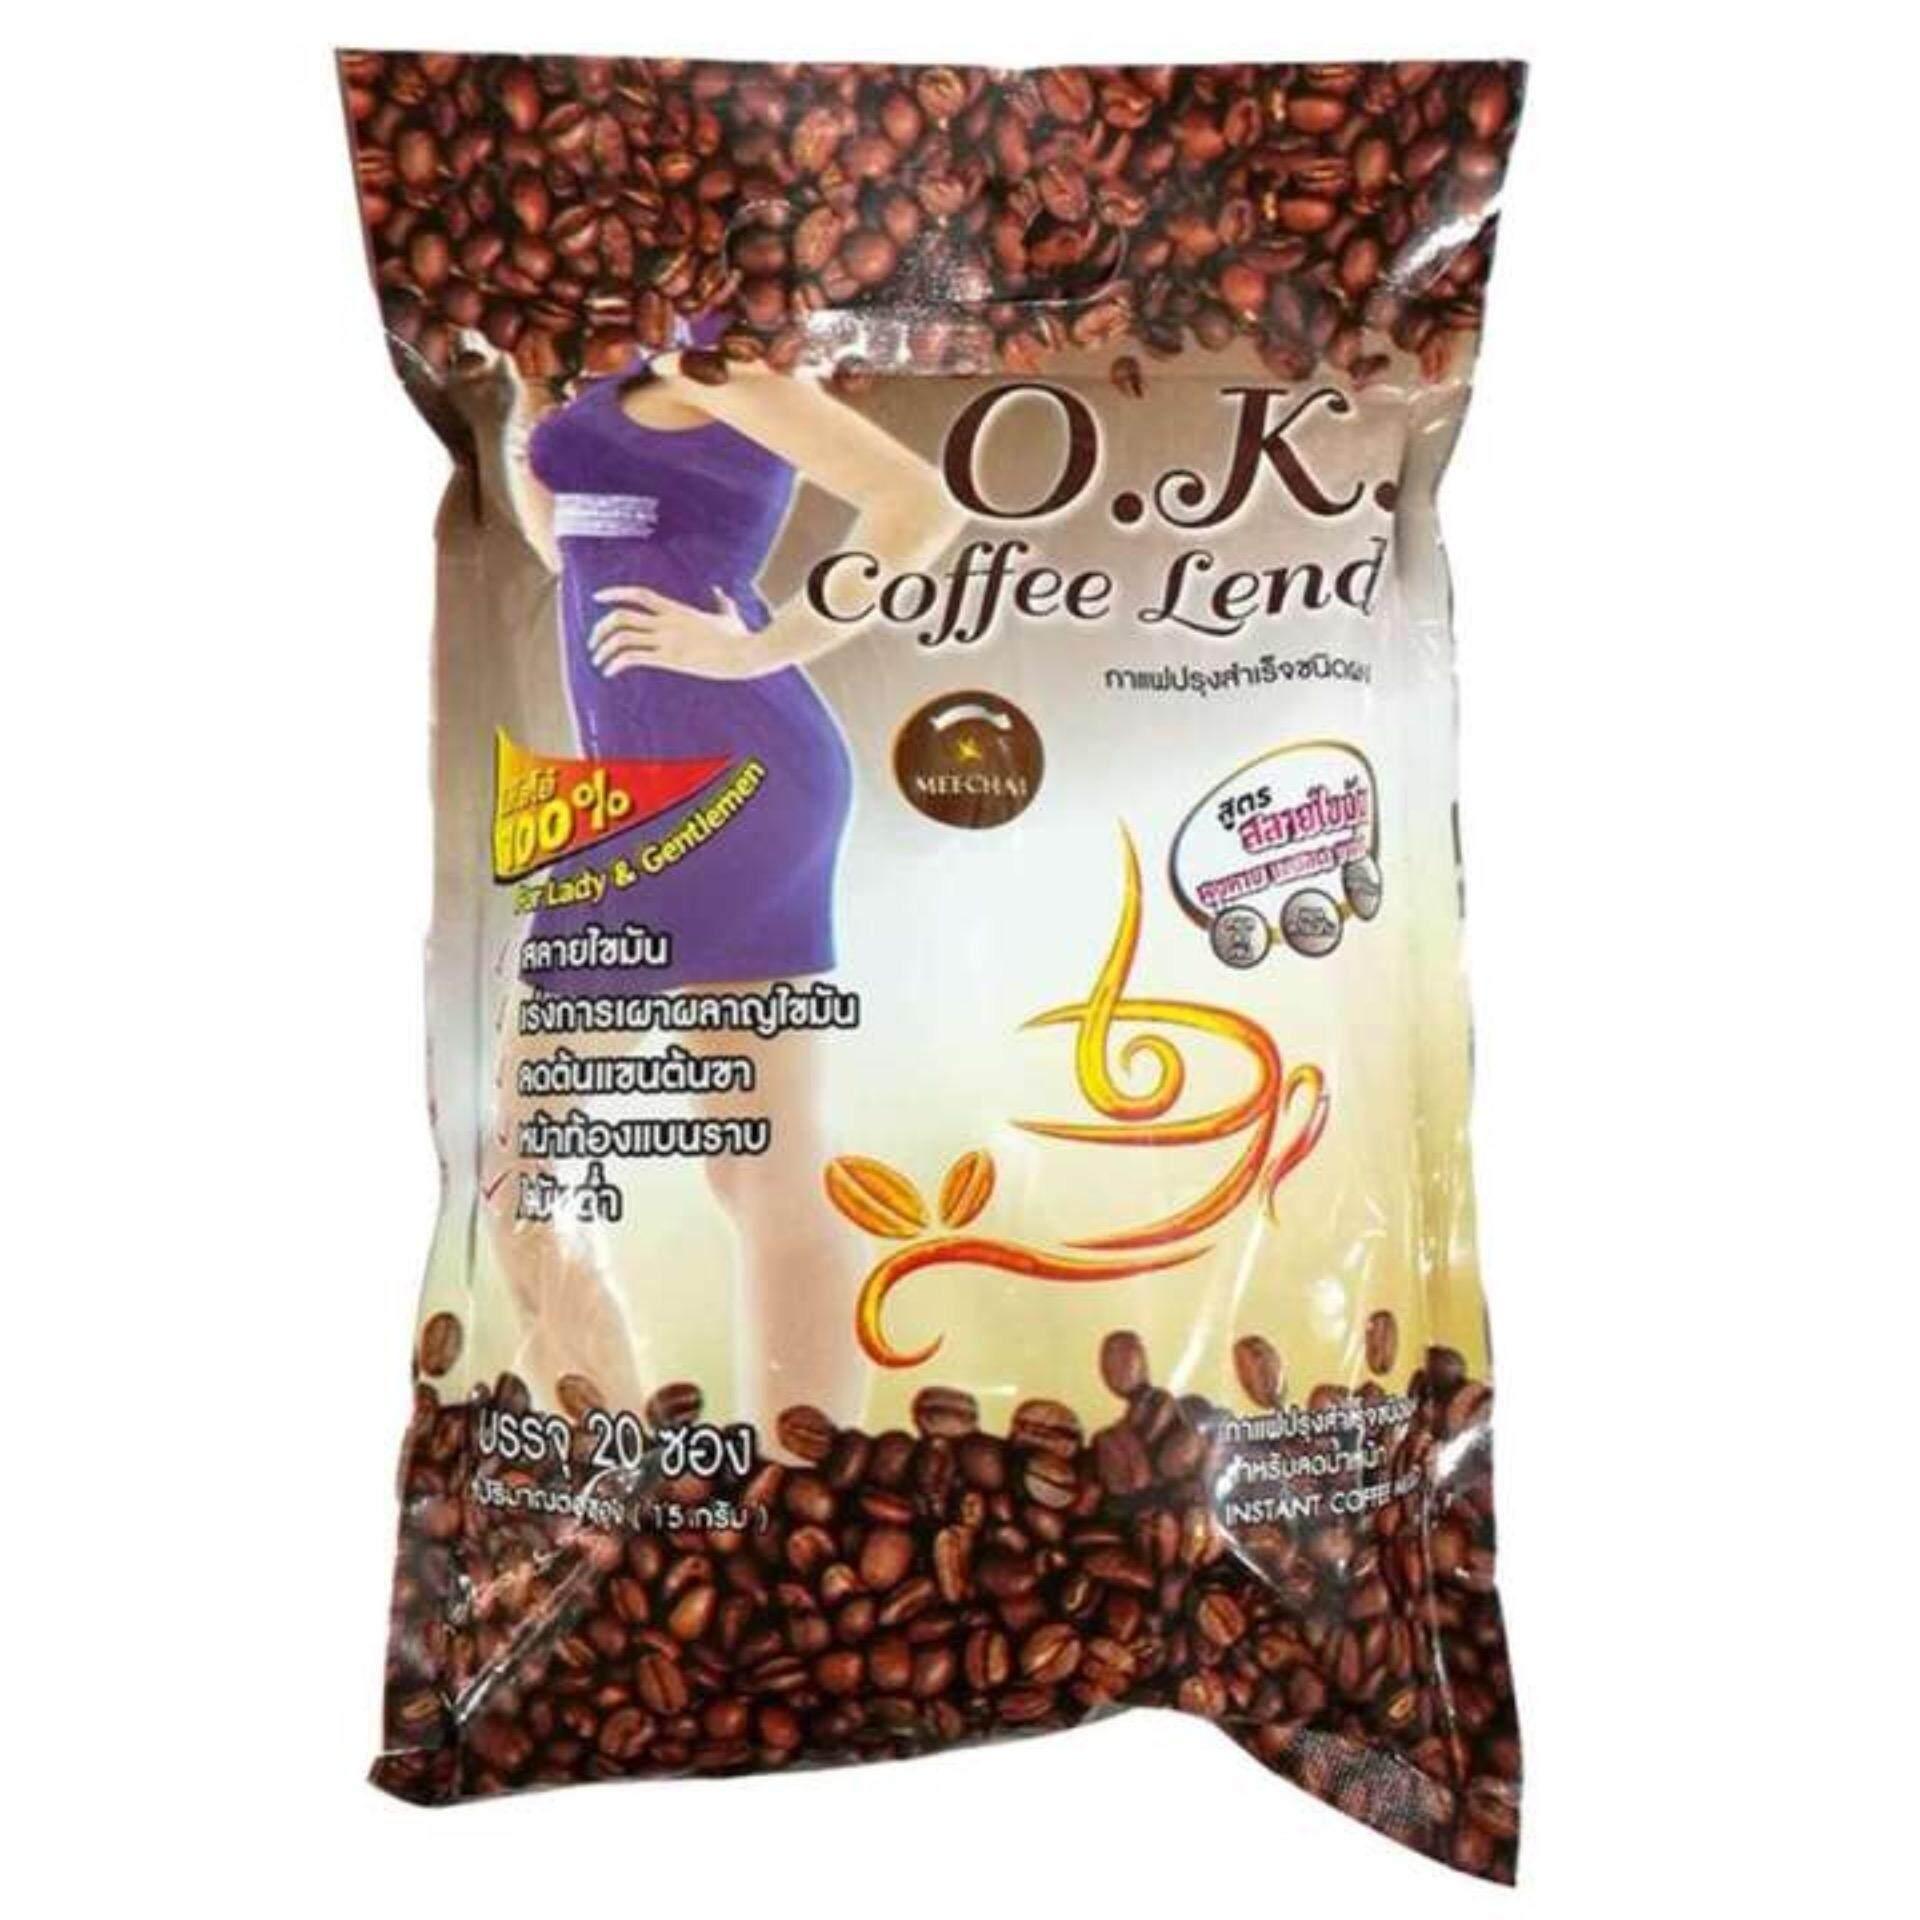 O.K. Coffee Lend กาแฟโอเค 1ห่อ*20ซอง